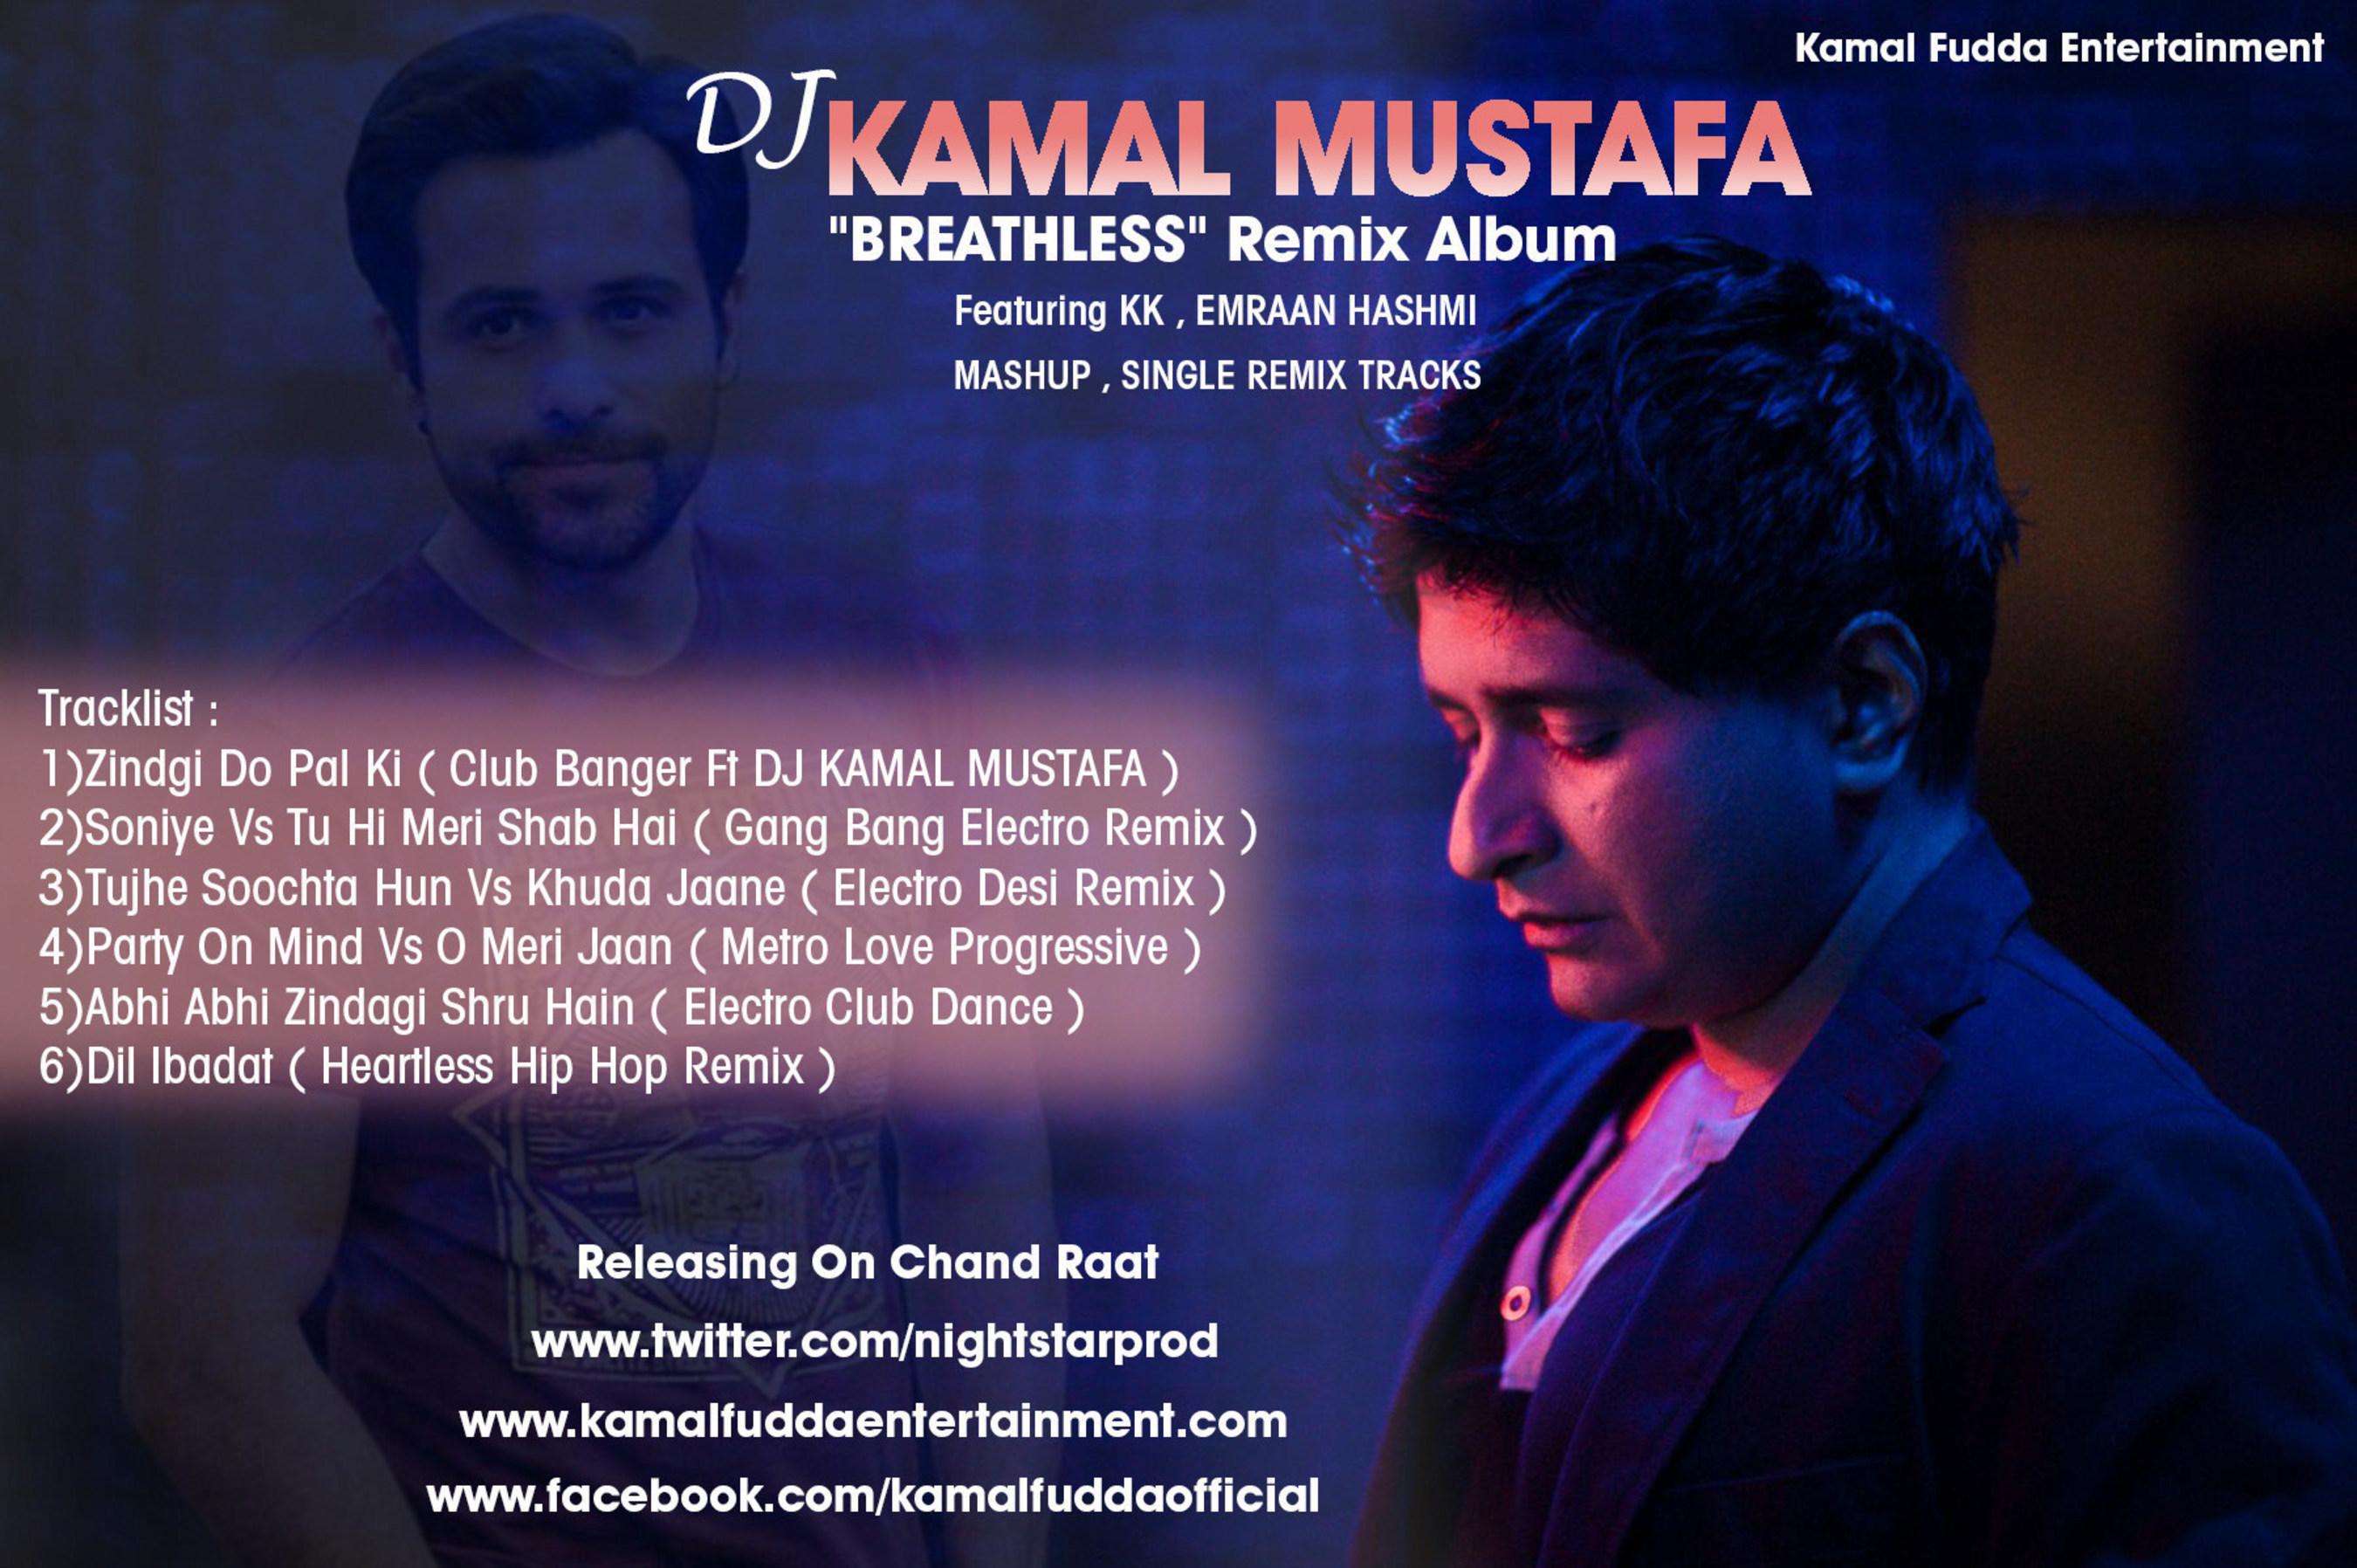 Dj Kamal Mustafa Releases 'Breathless' Remix Album Featuring KK